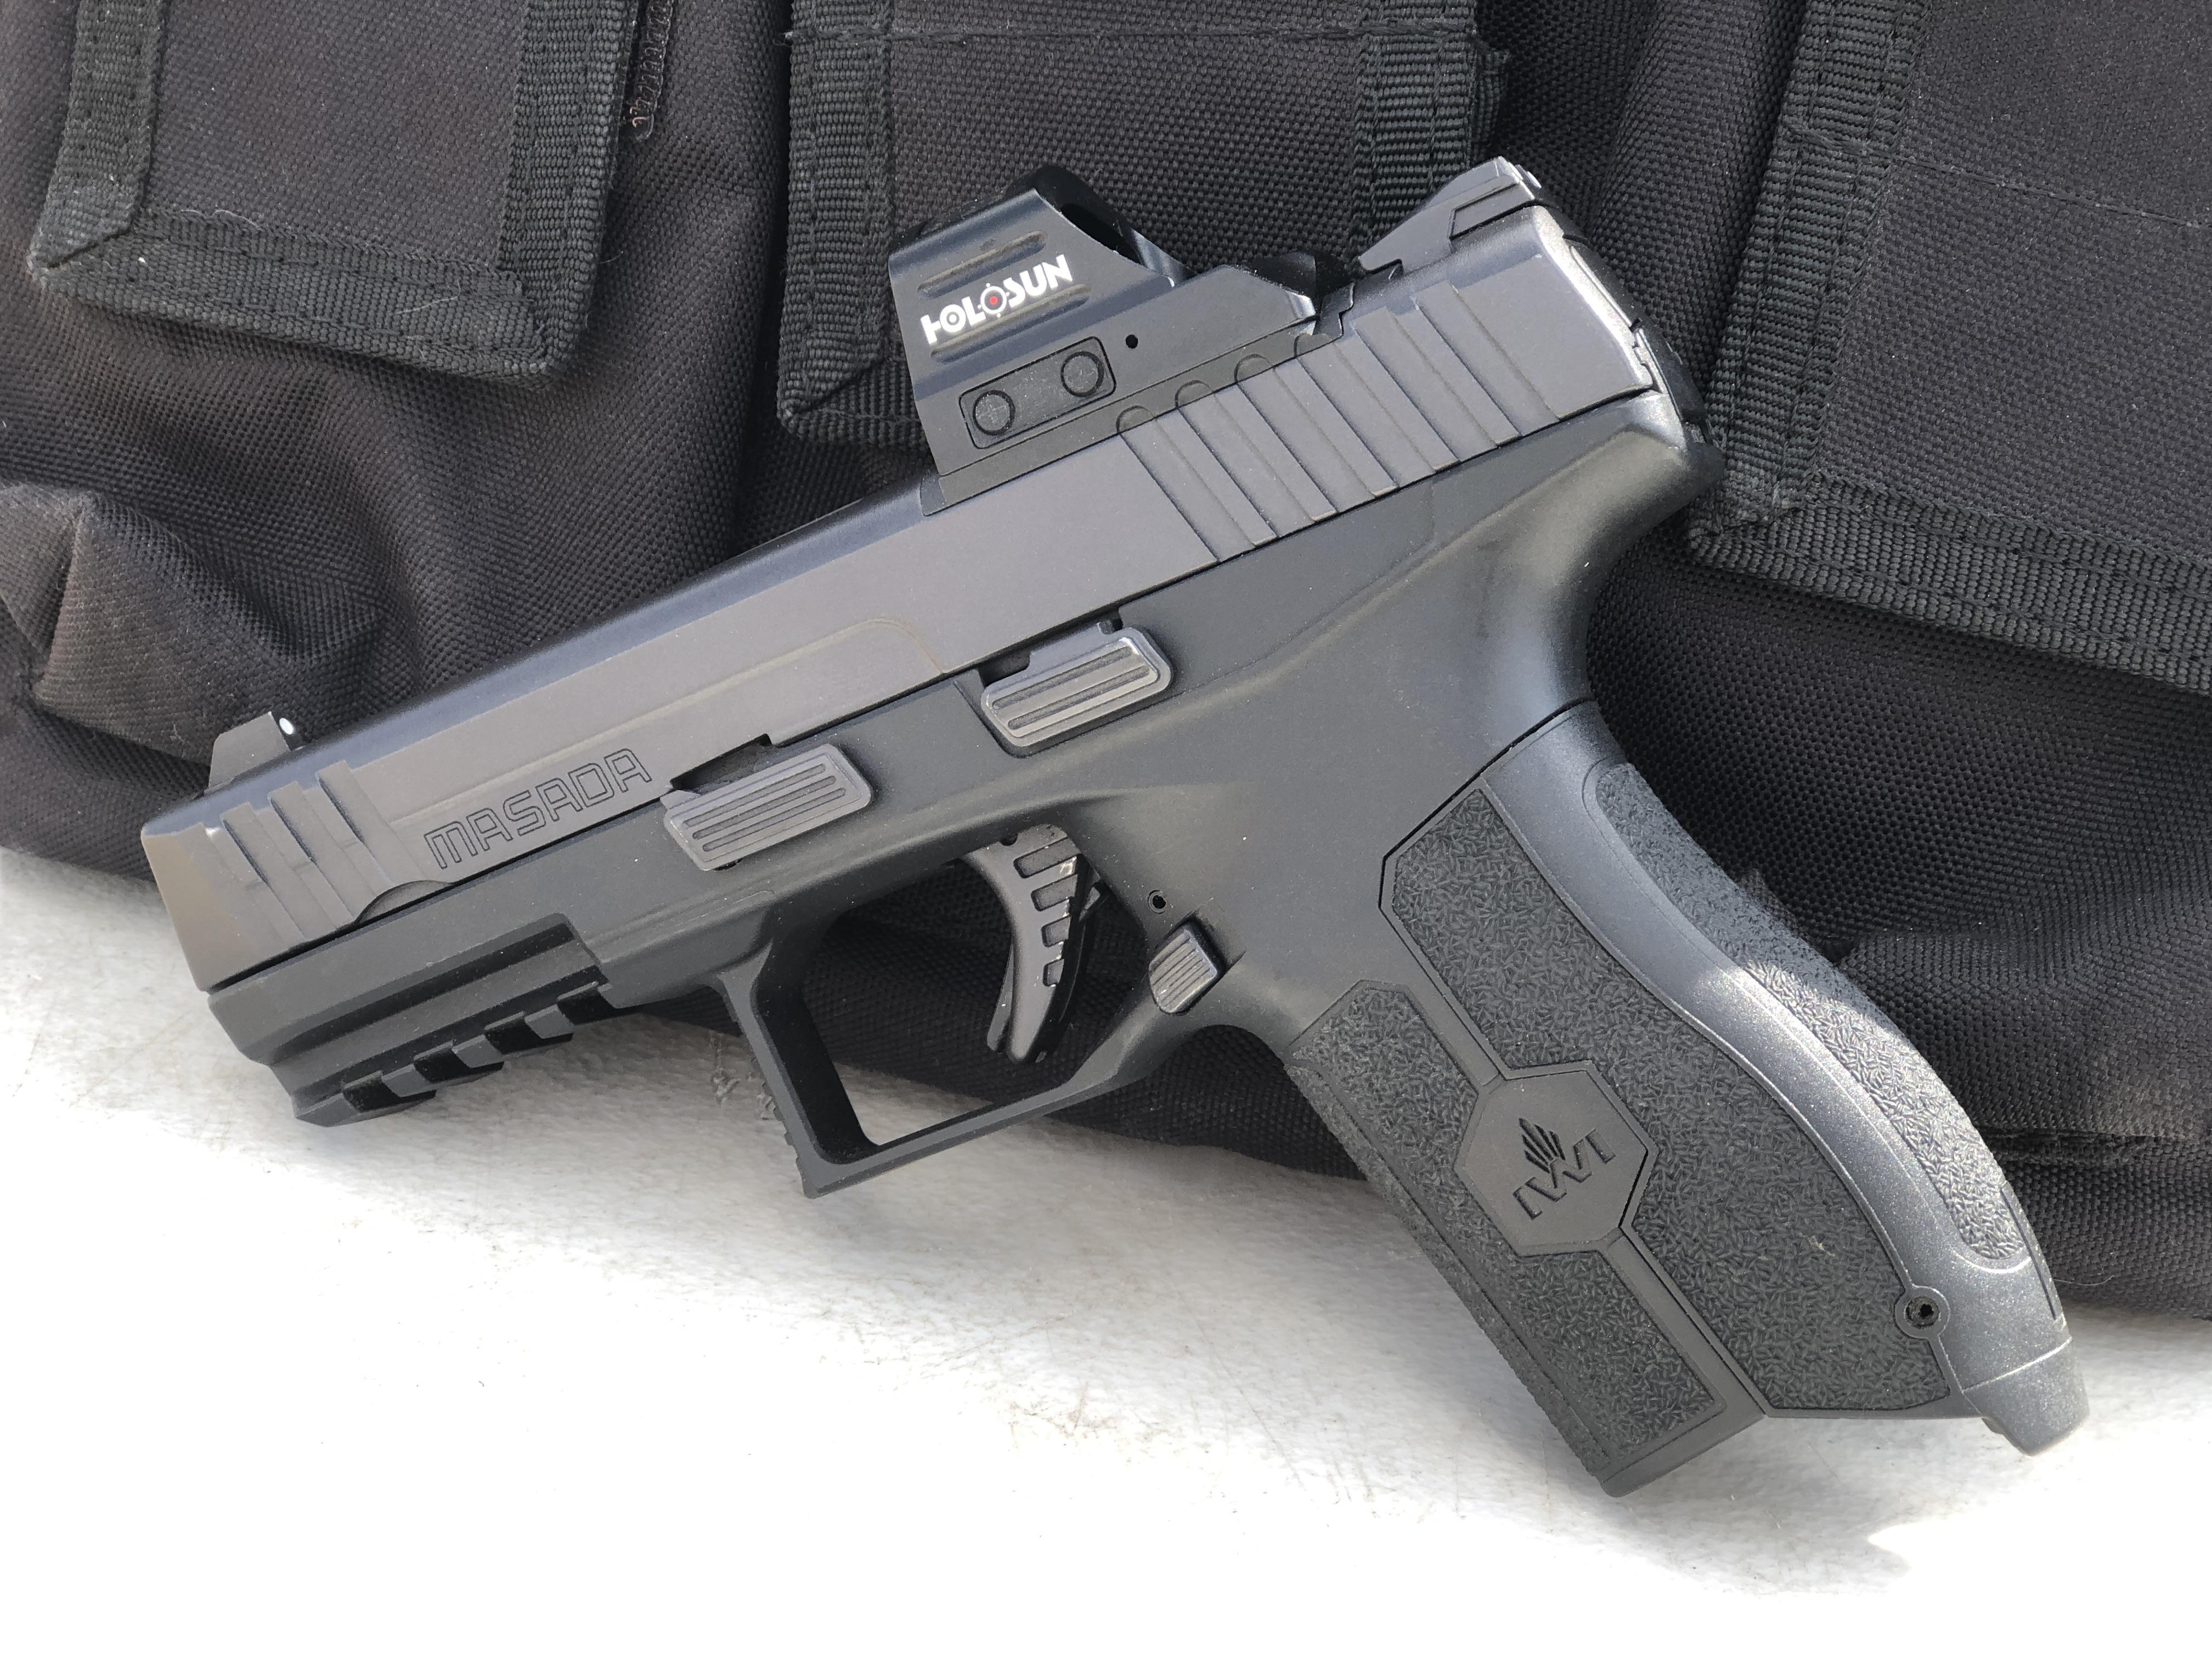 Iwi Masada Pistol Product Review Rainier Arms Blog Rainier Arms Blog